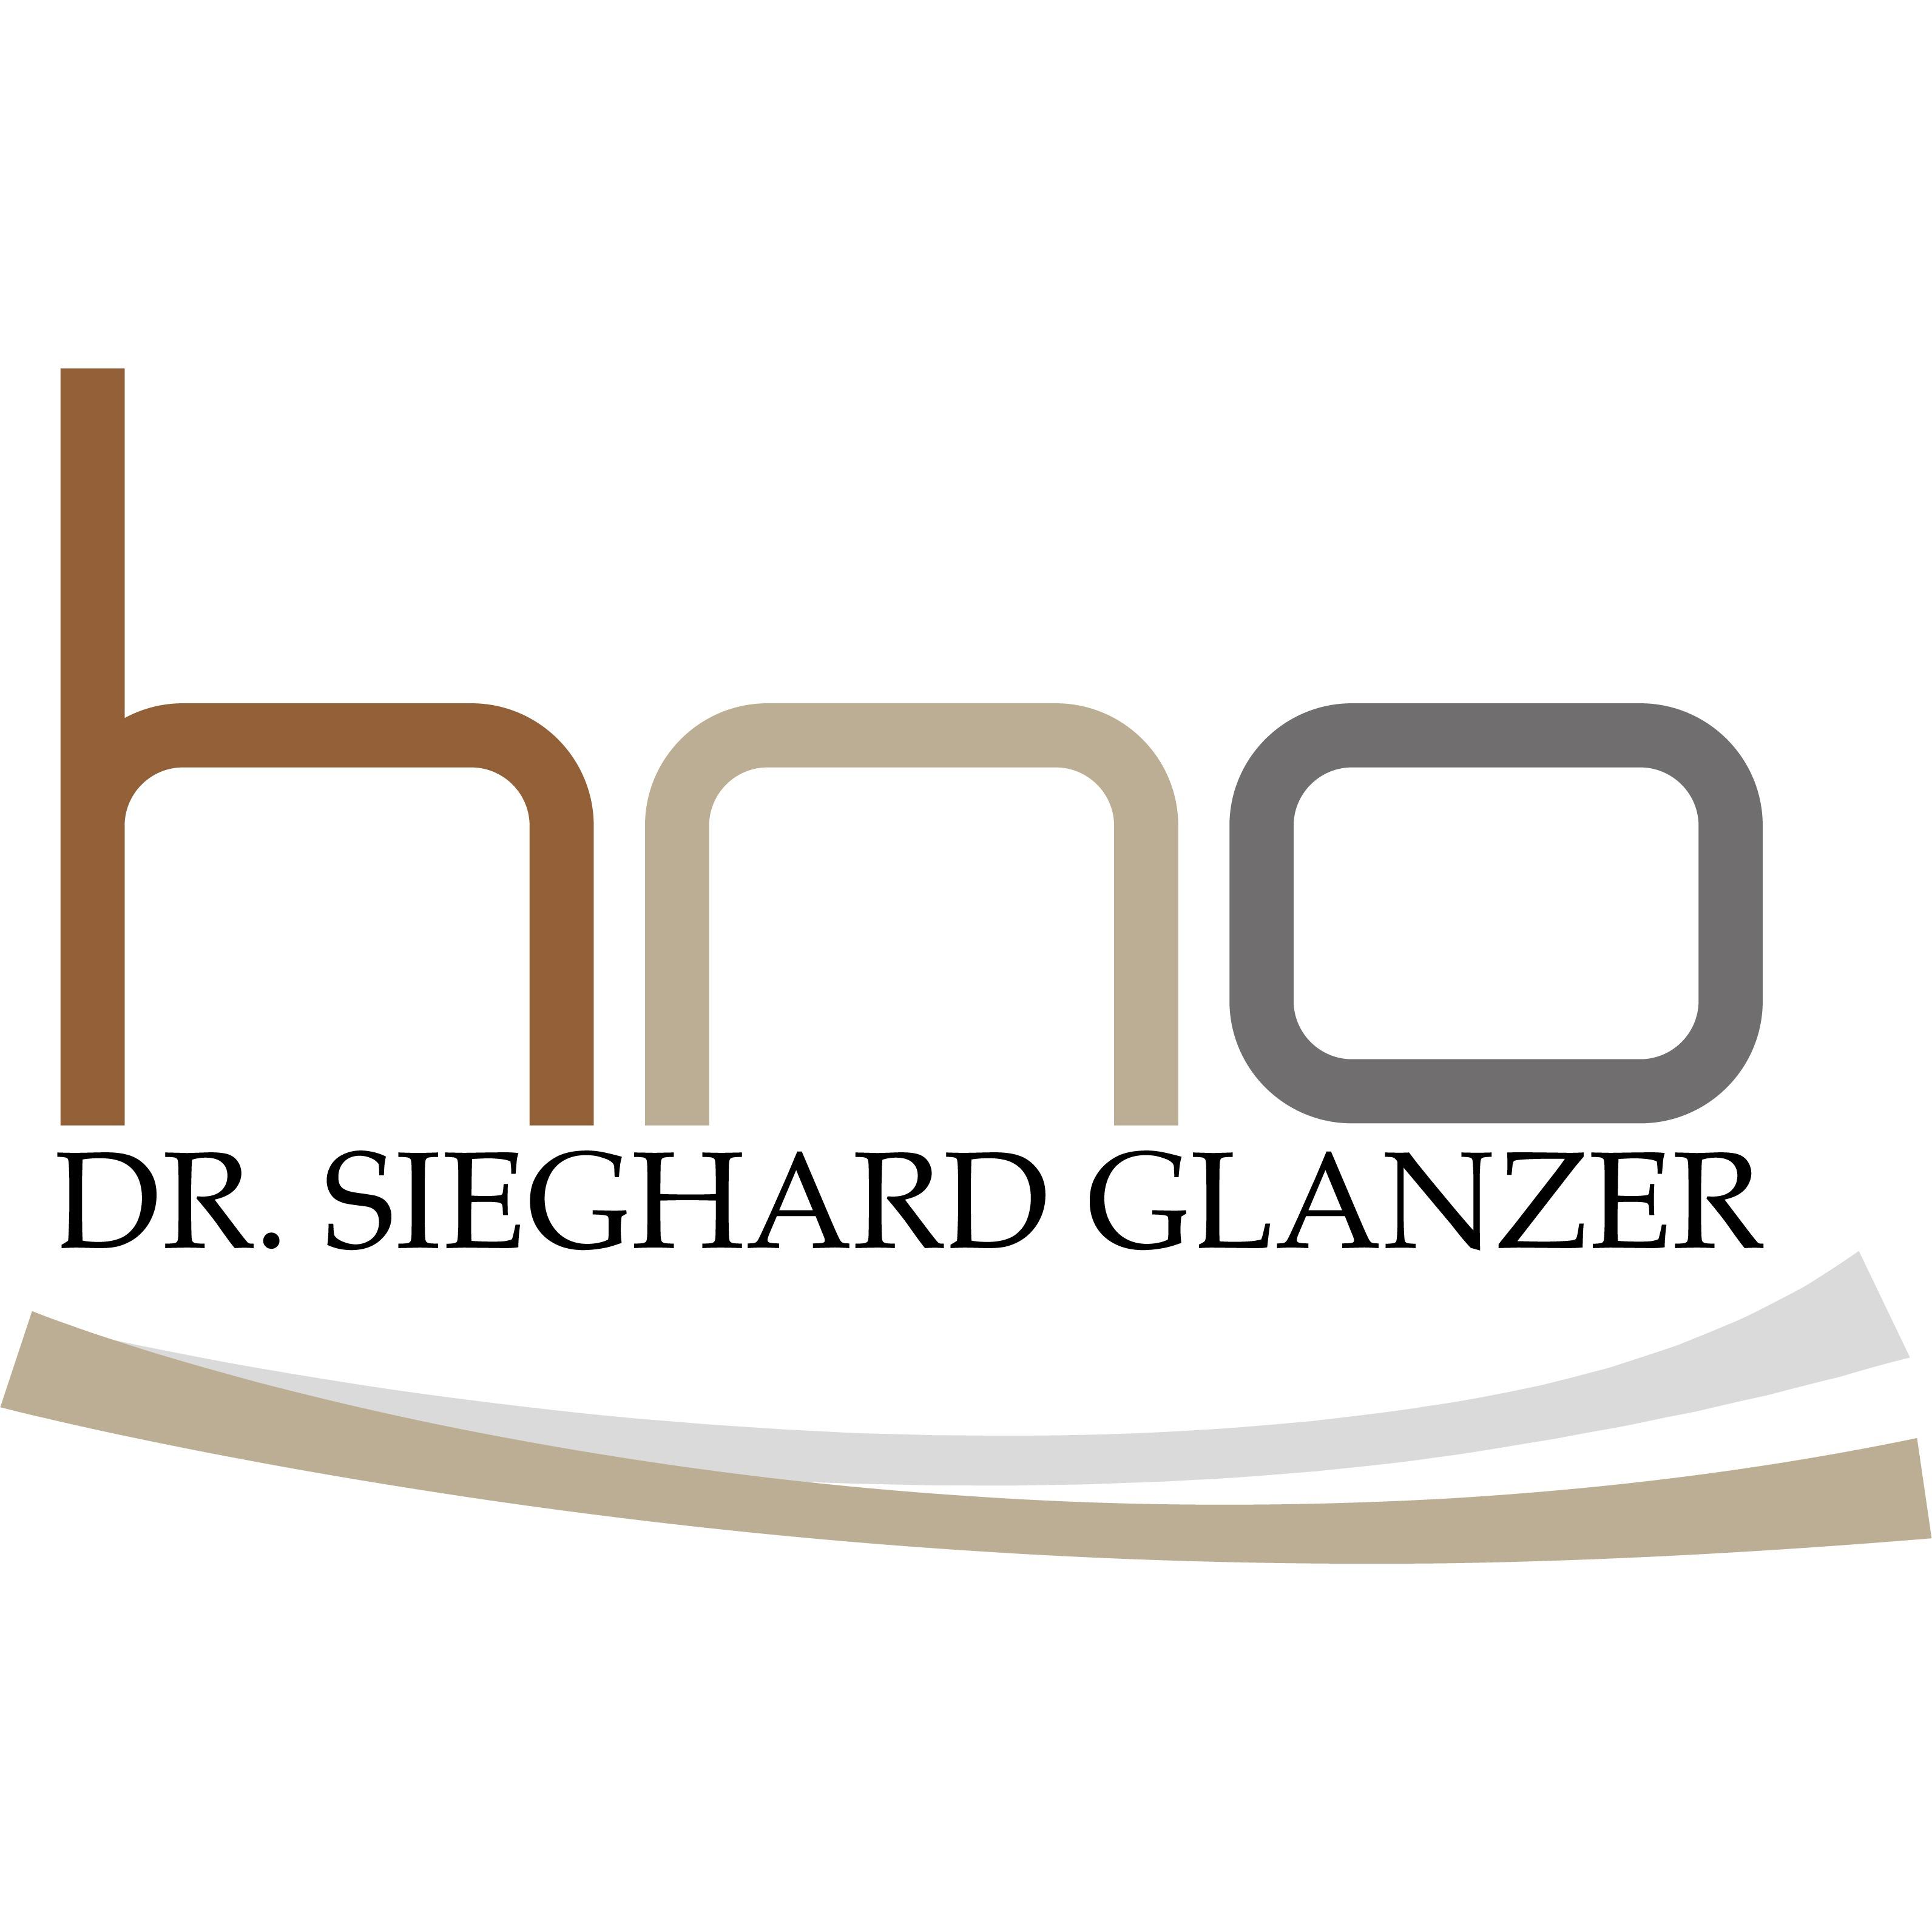 Dr. Sieghard Glanzer - Logo